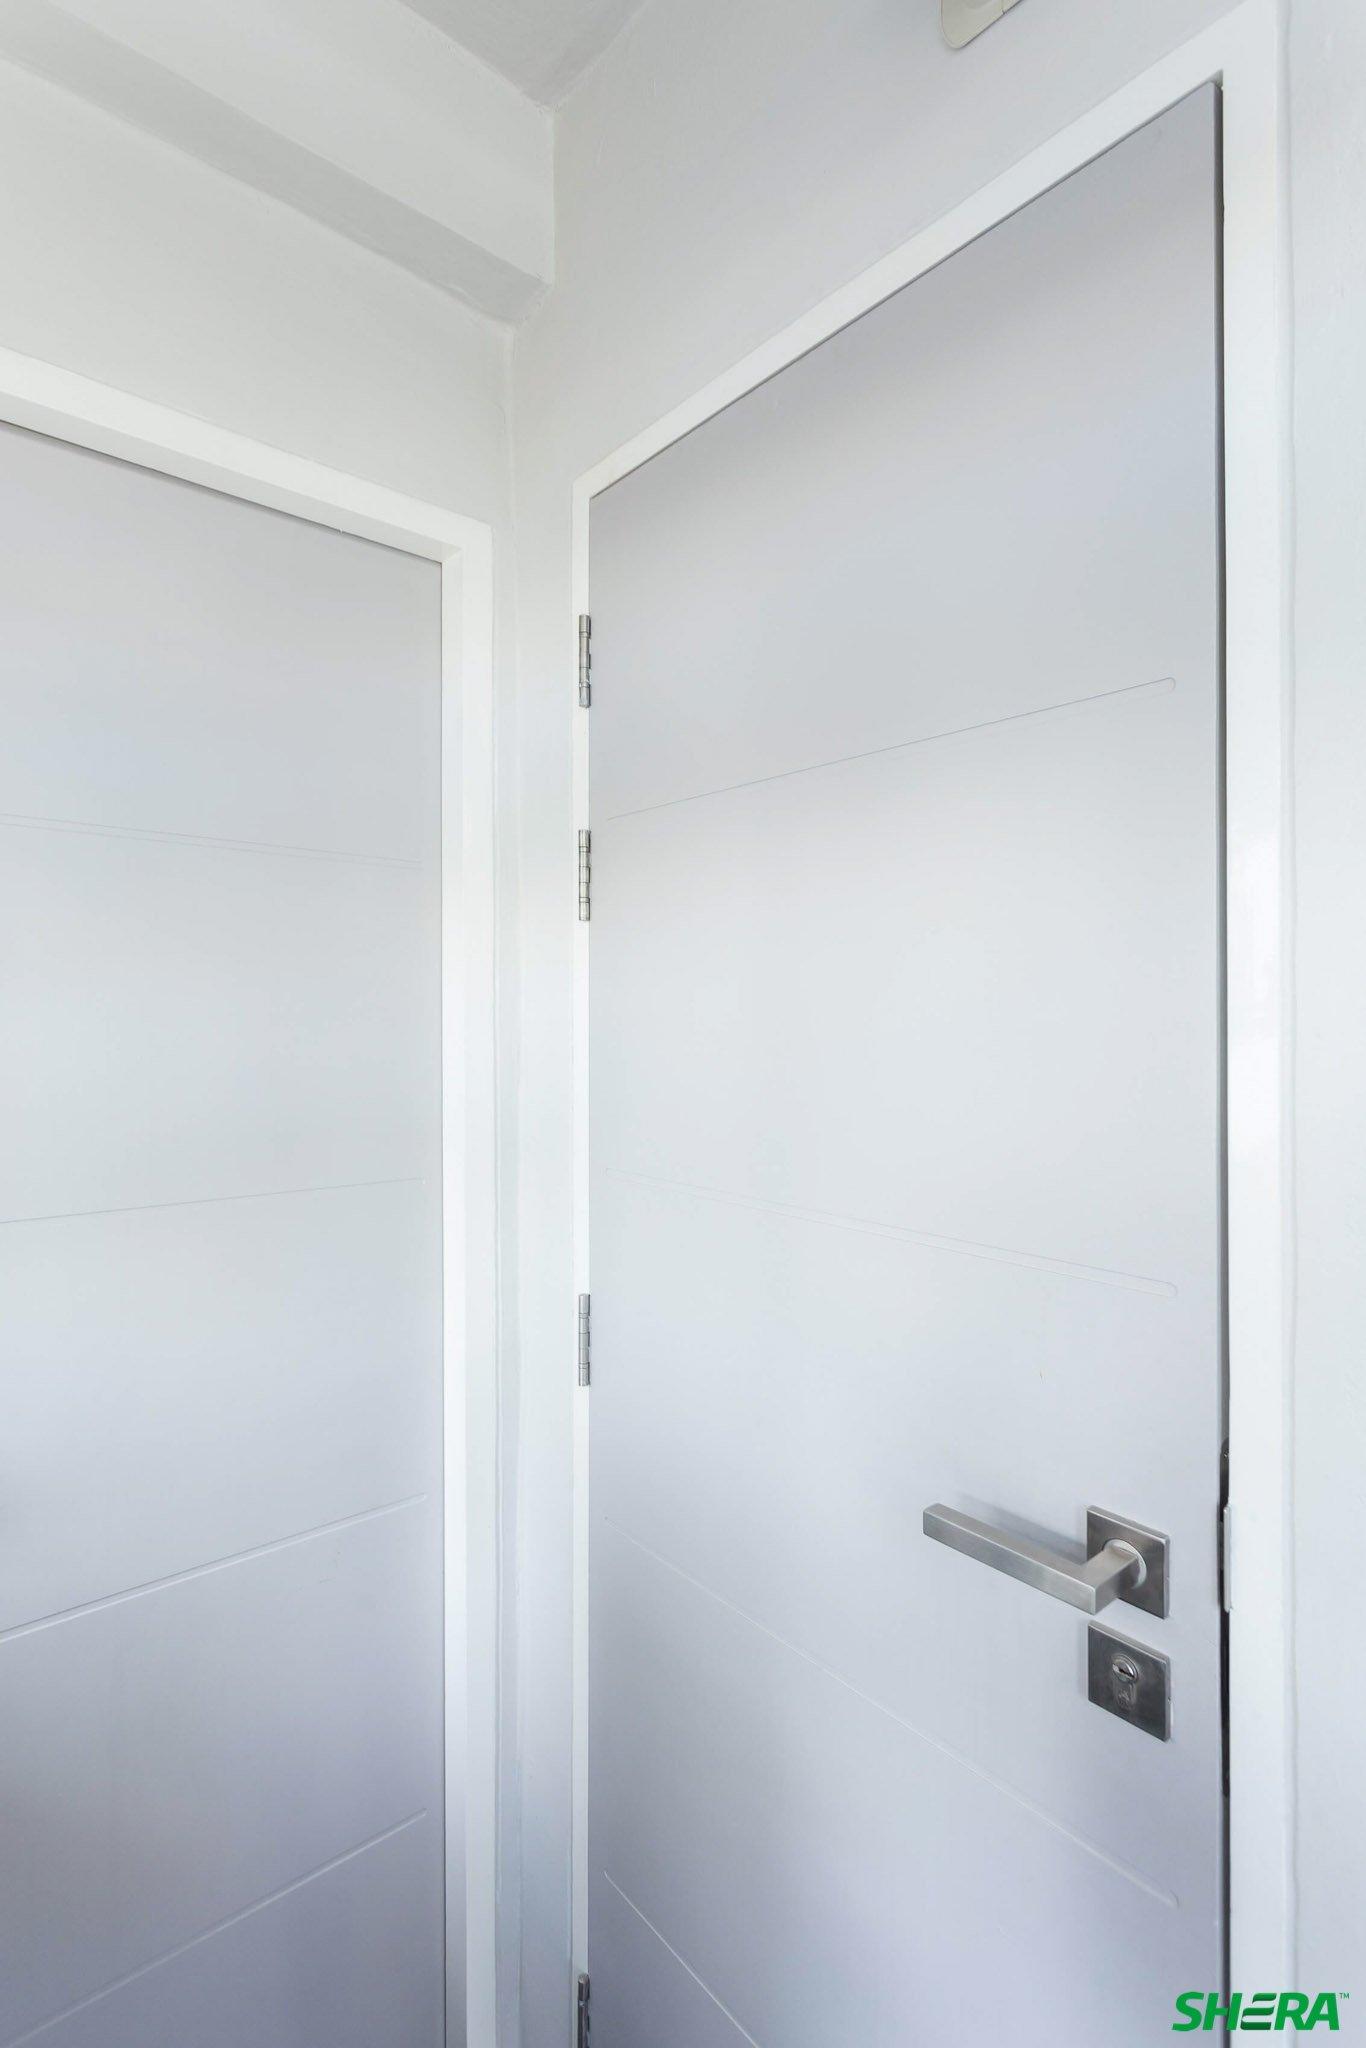 %name รีโนเวทบ้าน แปลงคอนโดเก่าเป็นสไตล์ Loft และประตูสวยทนด้วยไฟเบอร์ซีเมนต์จาก Shera